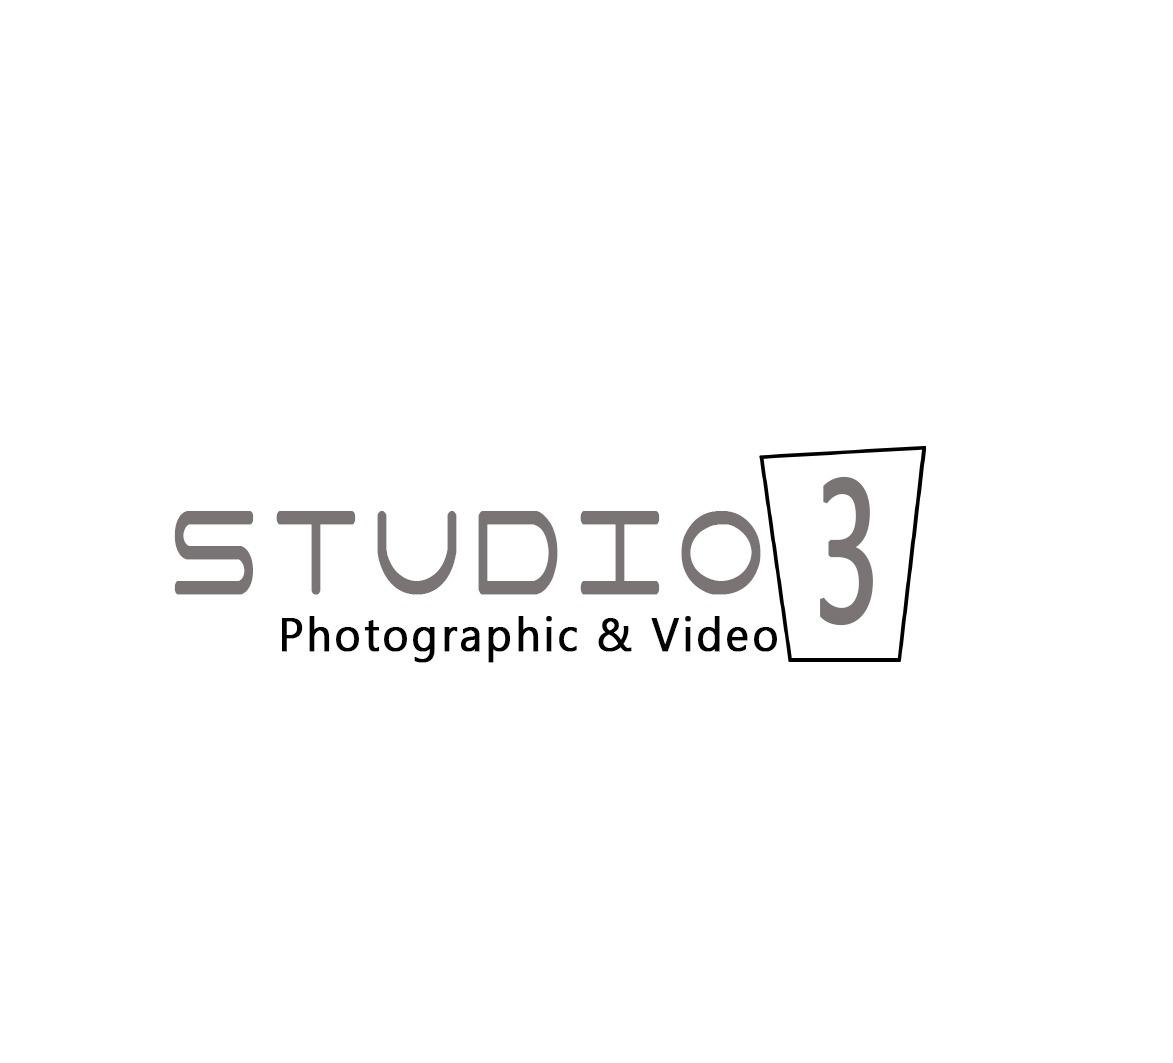 Studio%203%20name_edited